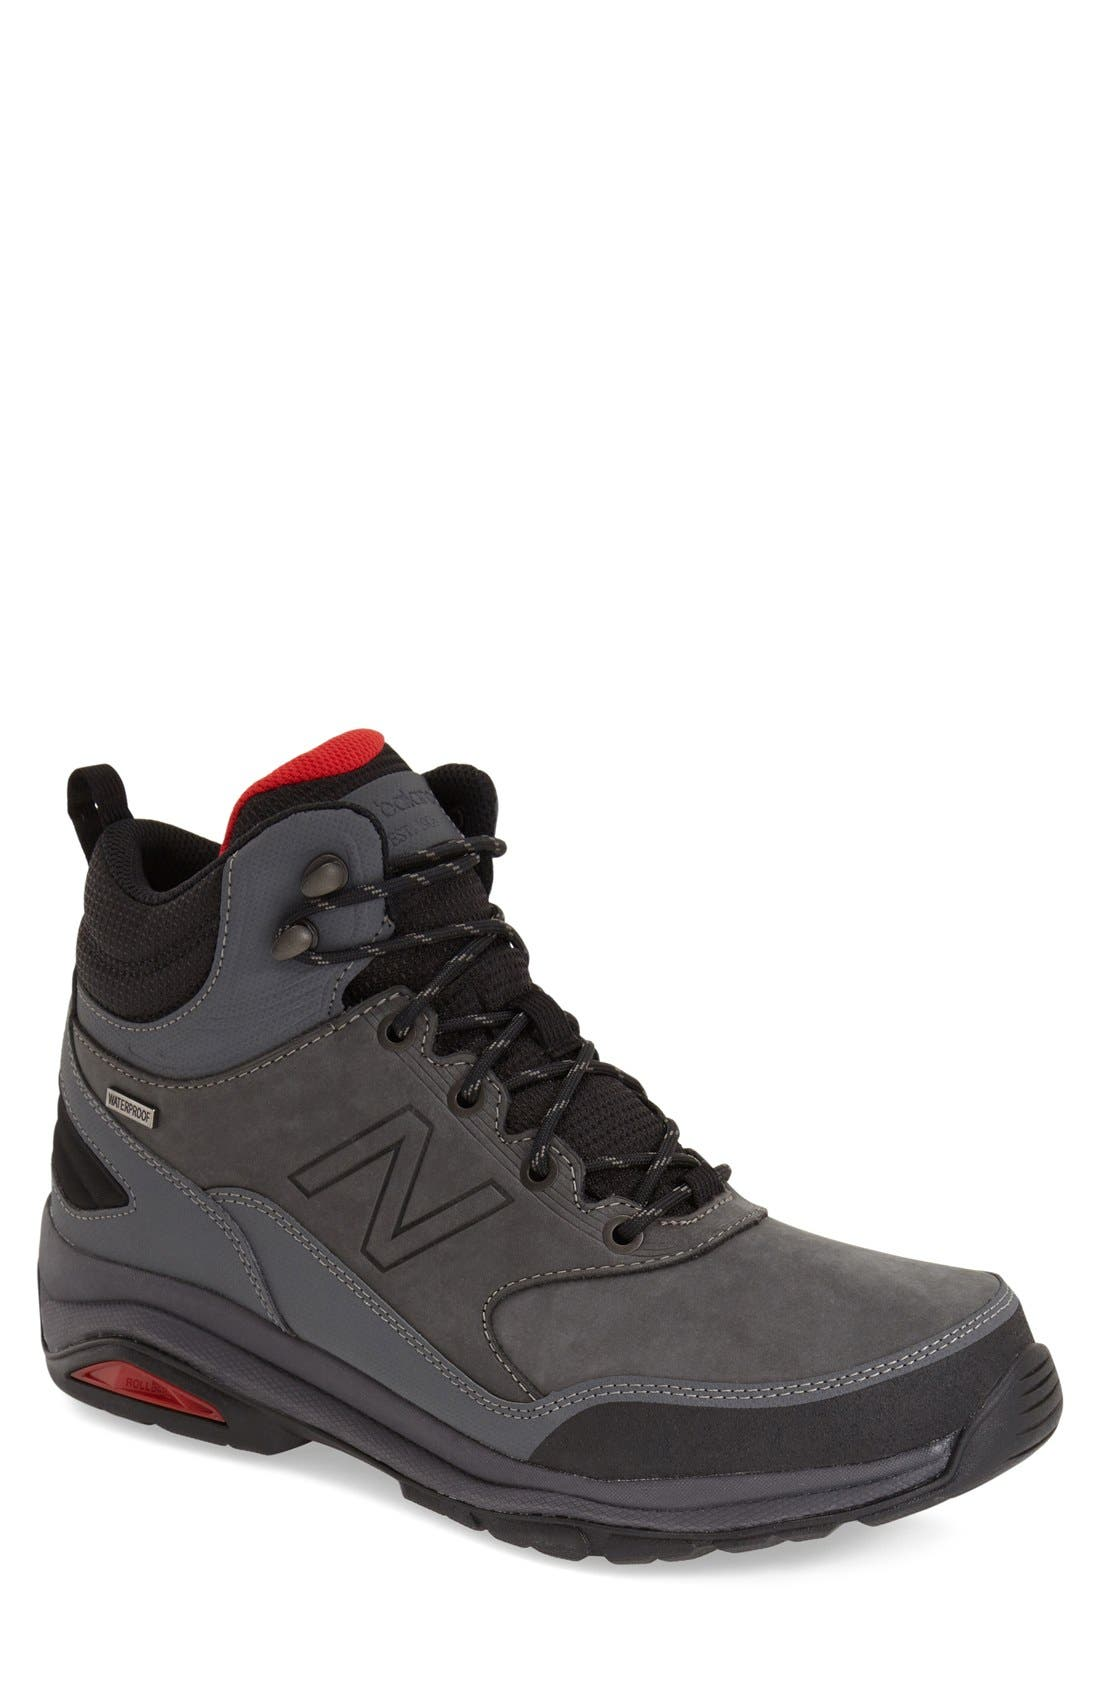 new balance hiking boots mens